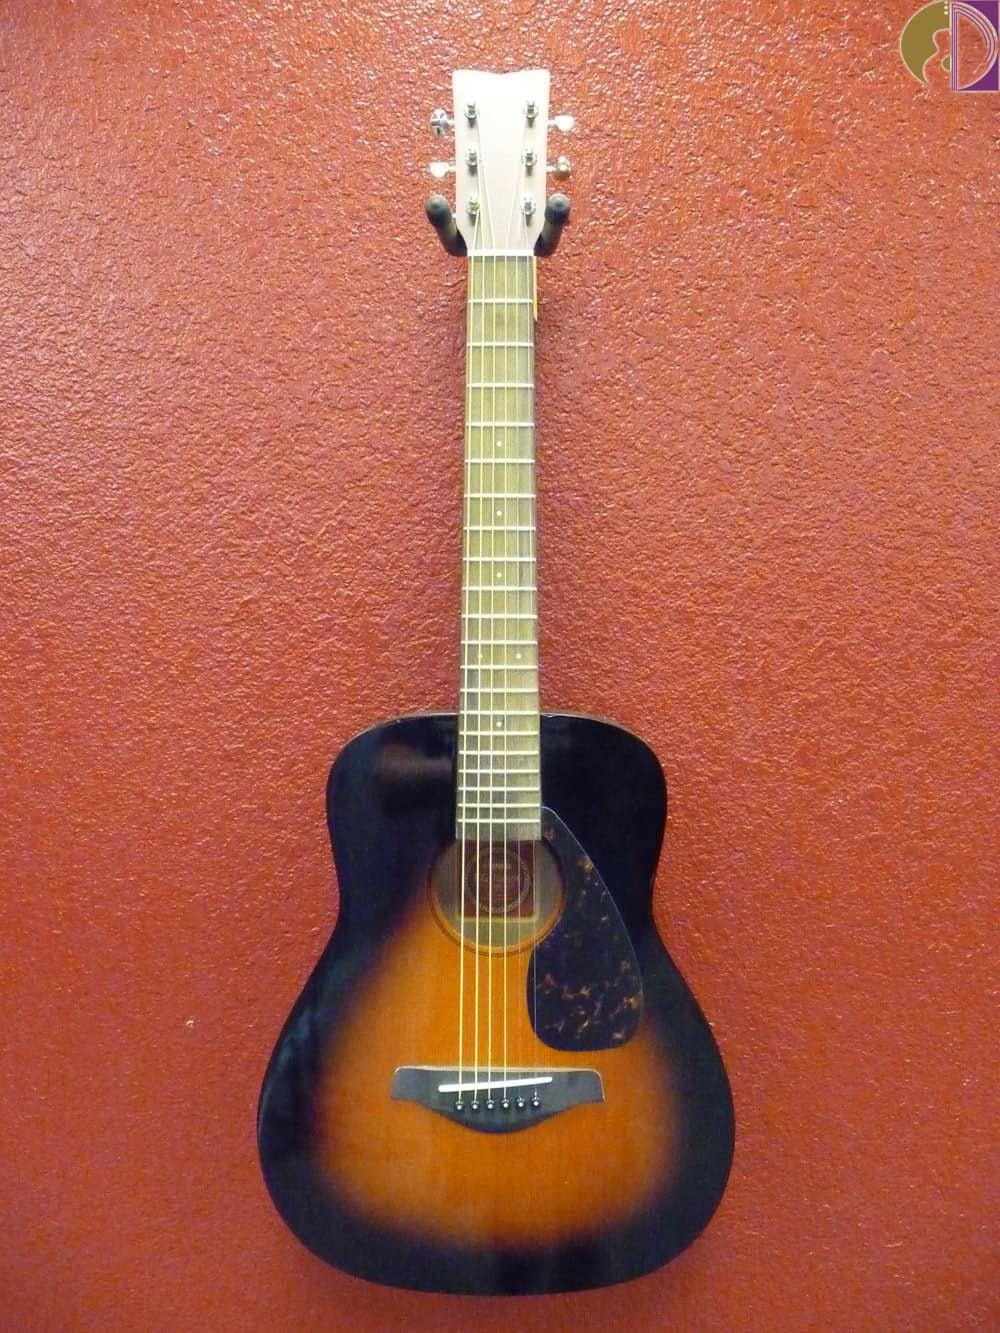 Yamaha jr2 3 4 scale student guitar tobacco sunburst reverb for Yamaha jr2 3 4